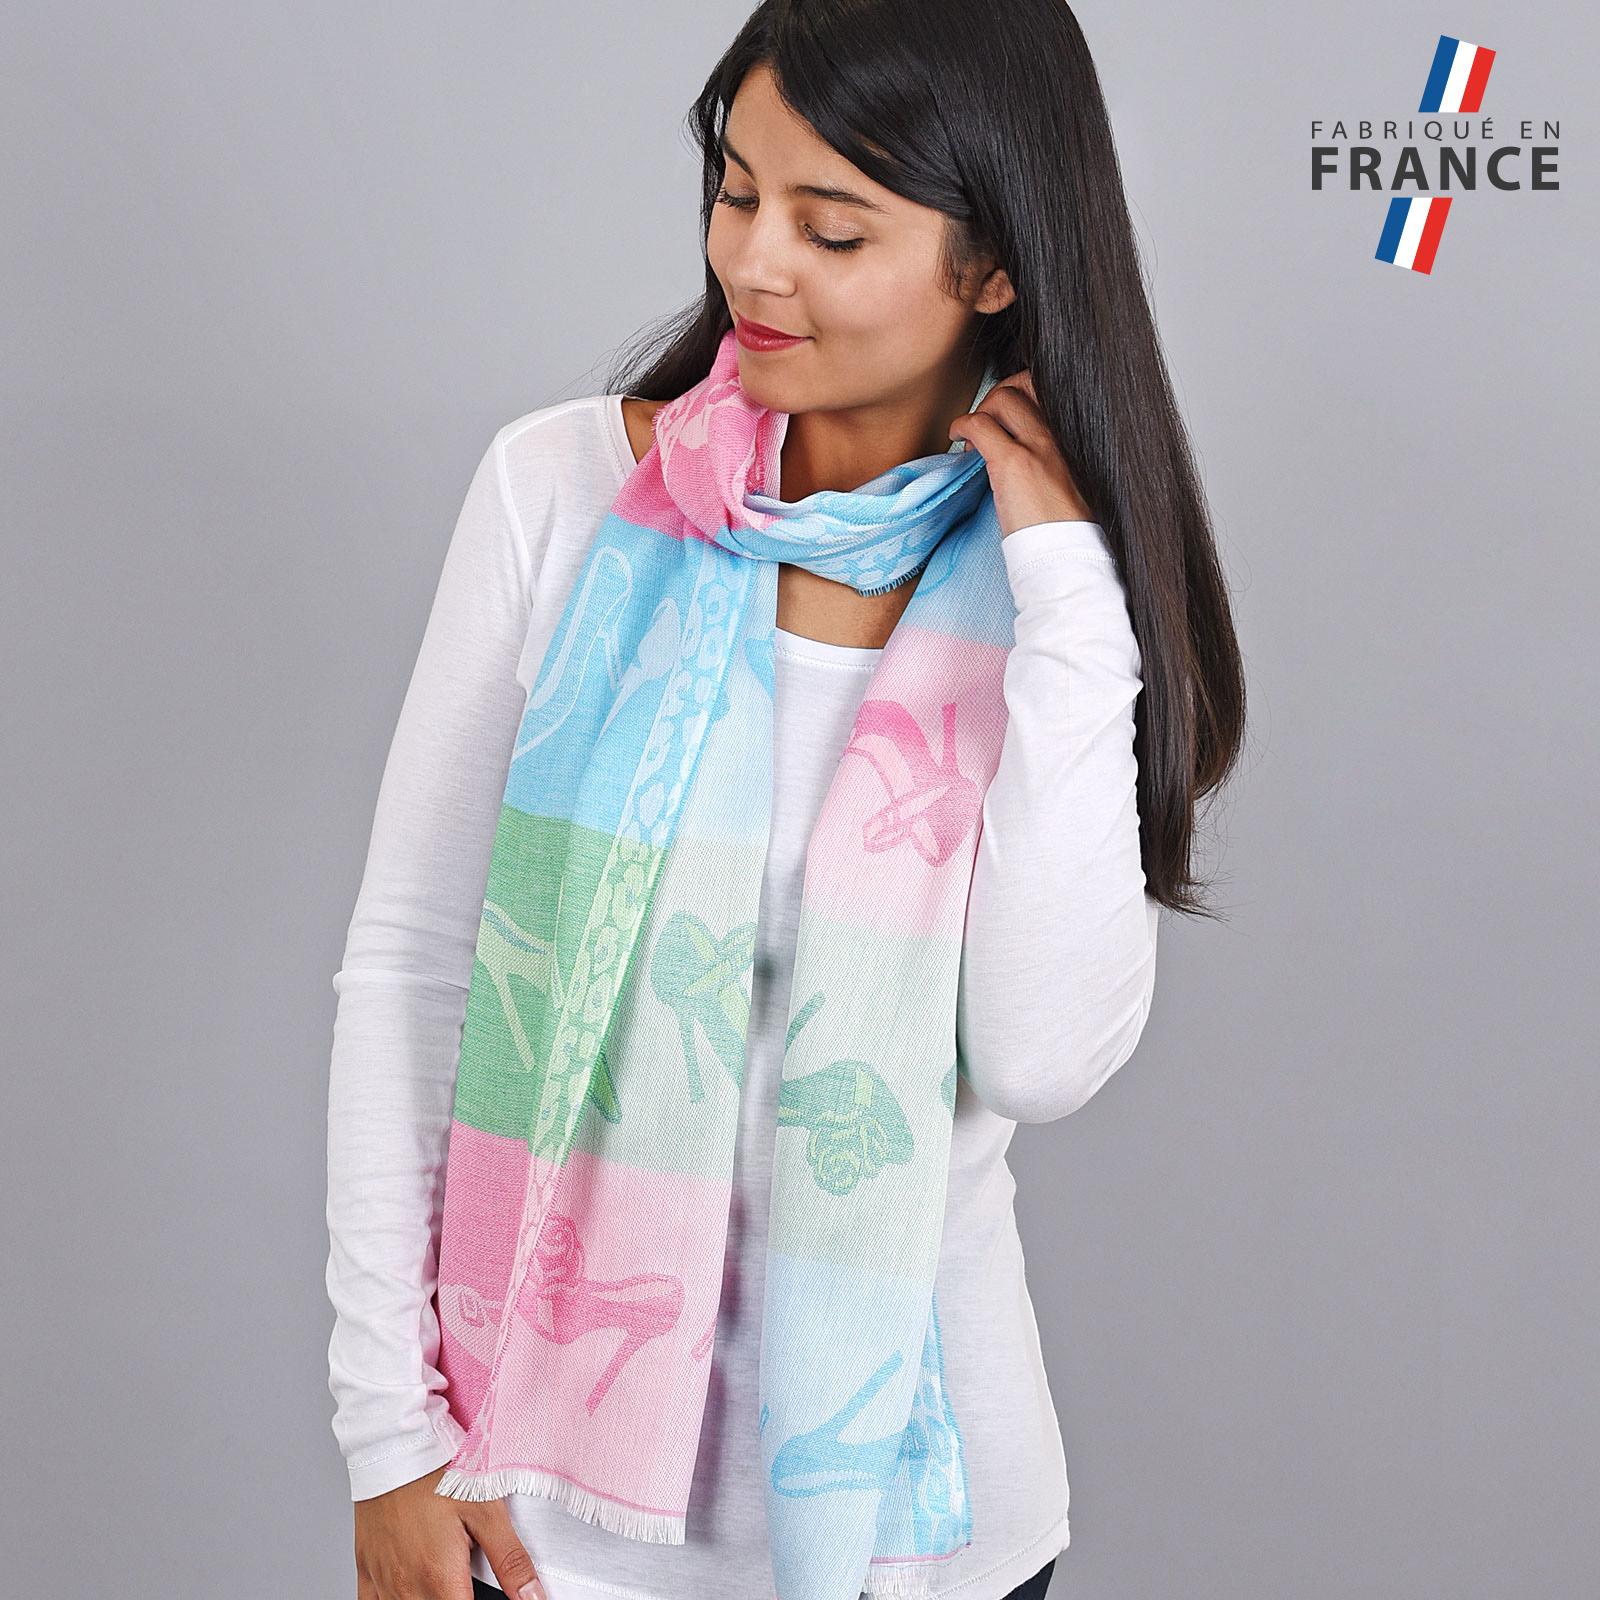 AT-04199-VF16-LB_FR-echarpe-femme-multicolore-fabrication-france